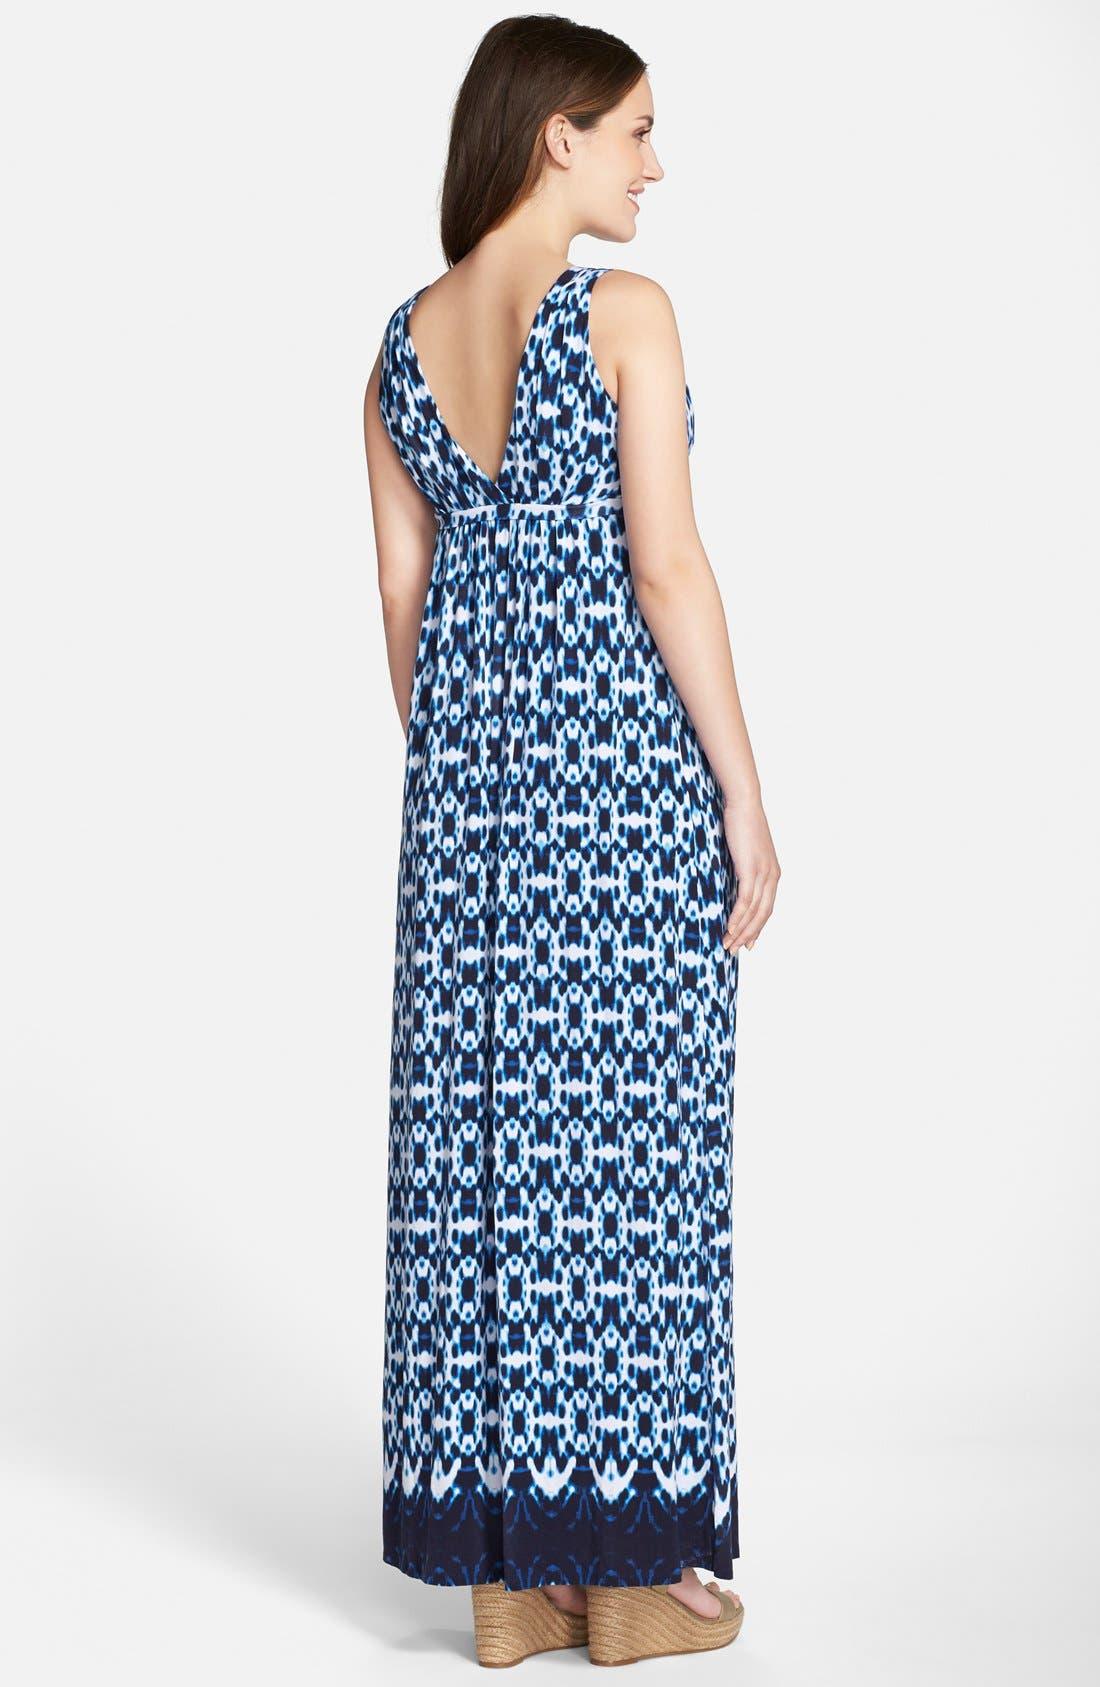 'Chloe' Maternity Maxi Dress,                             Alternate thumbnail 2, color,                             Circle Tie Dye